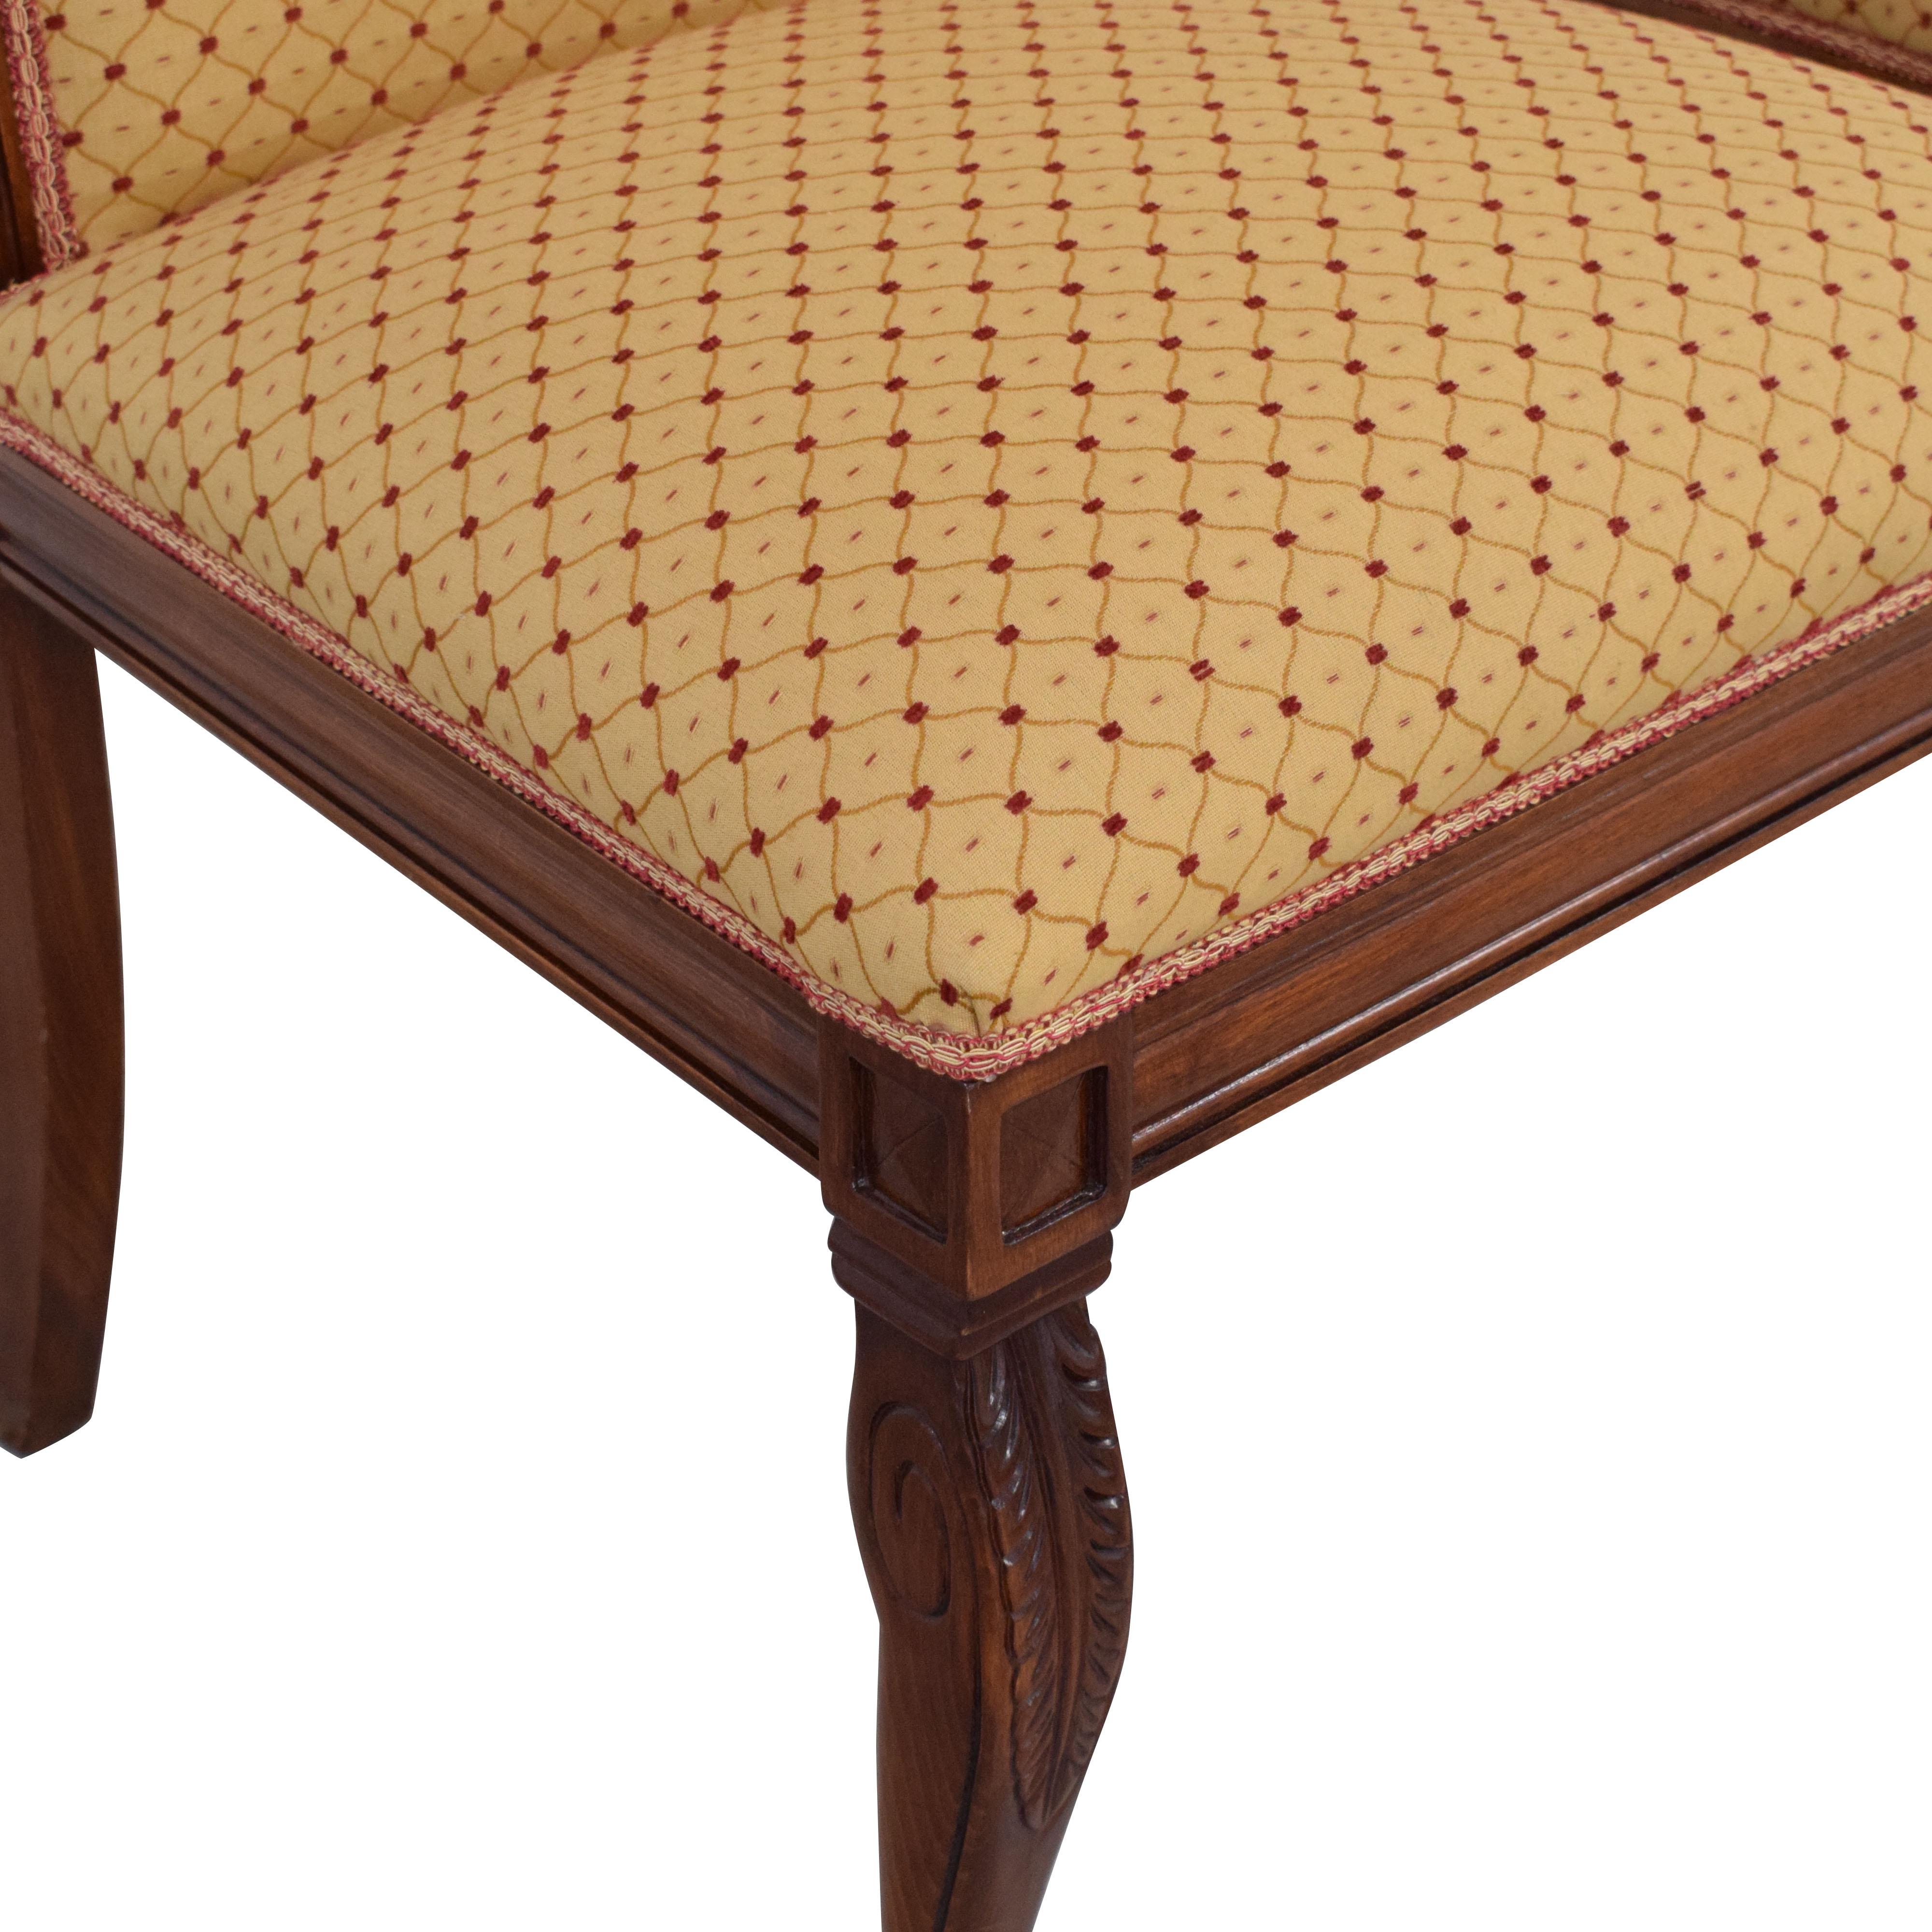 KPS Furnishings KPS Furnishings Custom Dining Chairs for sale